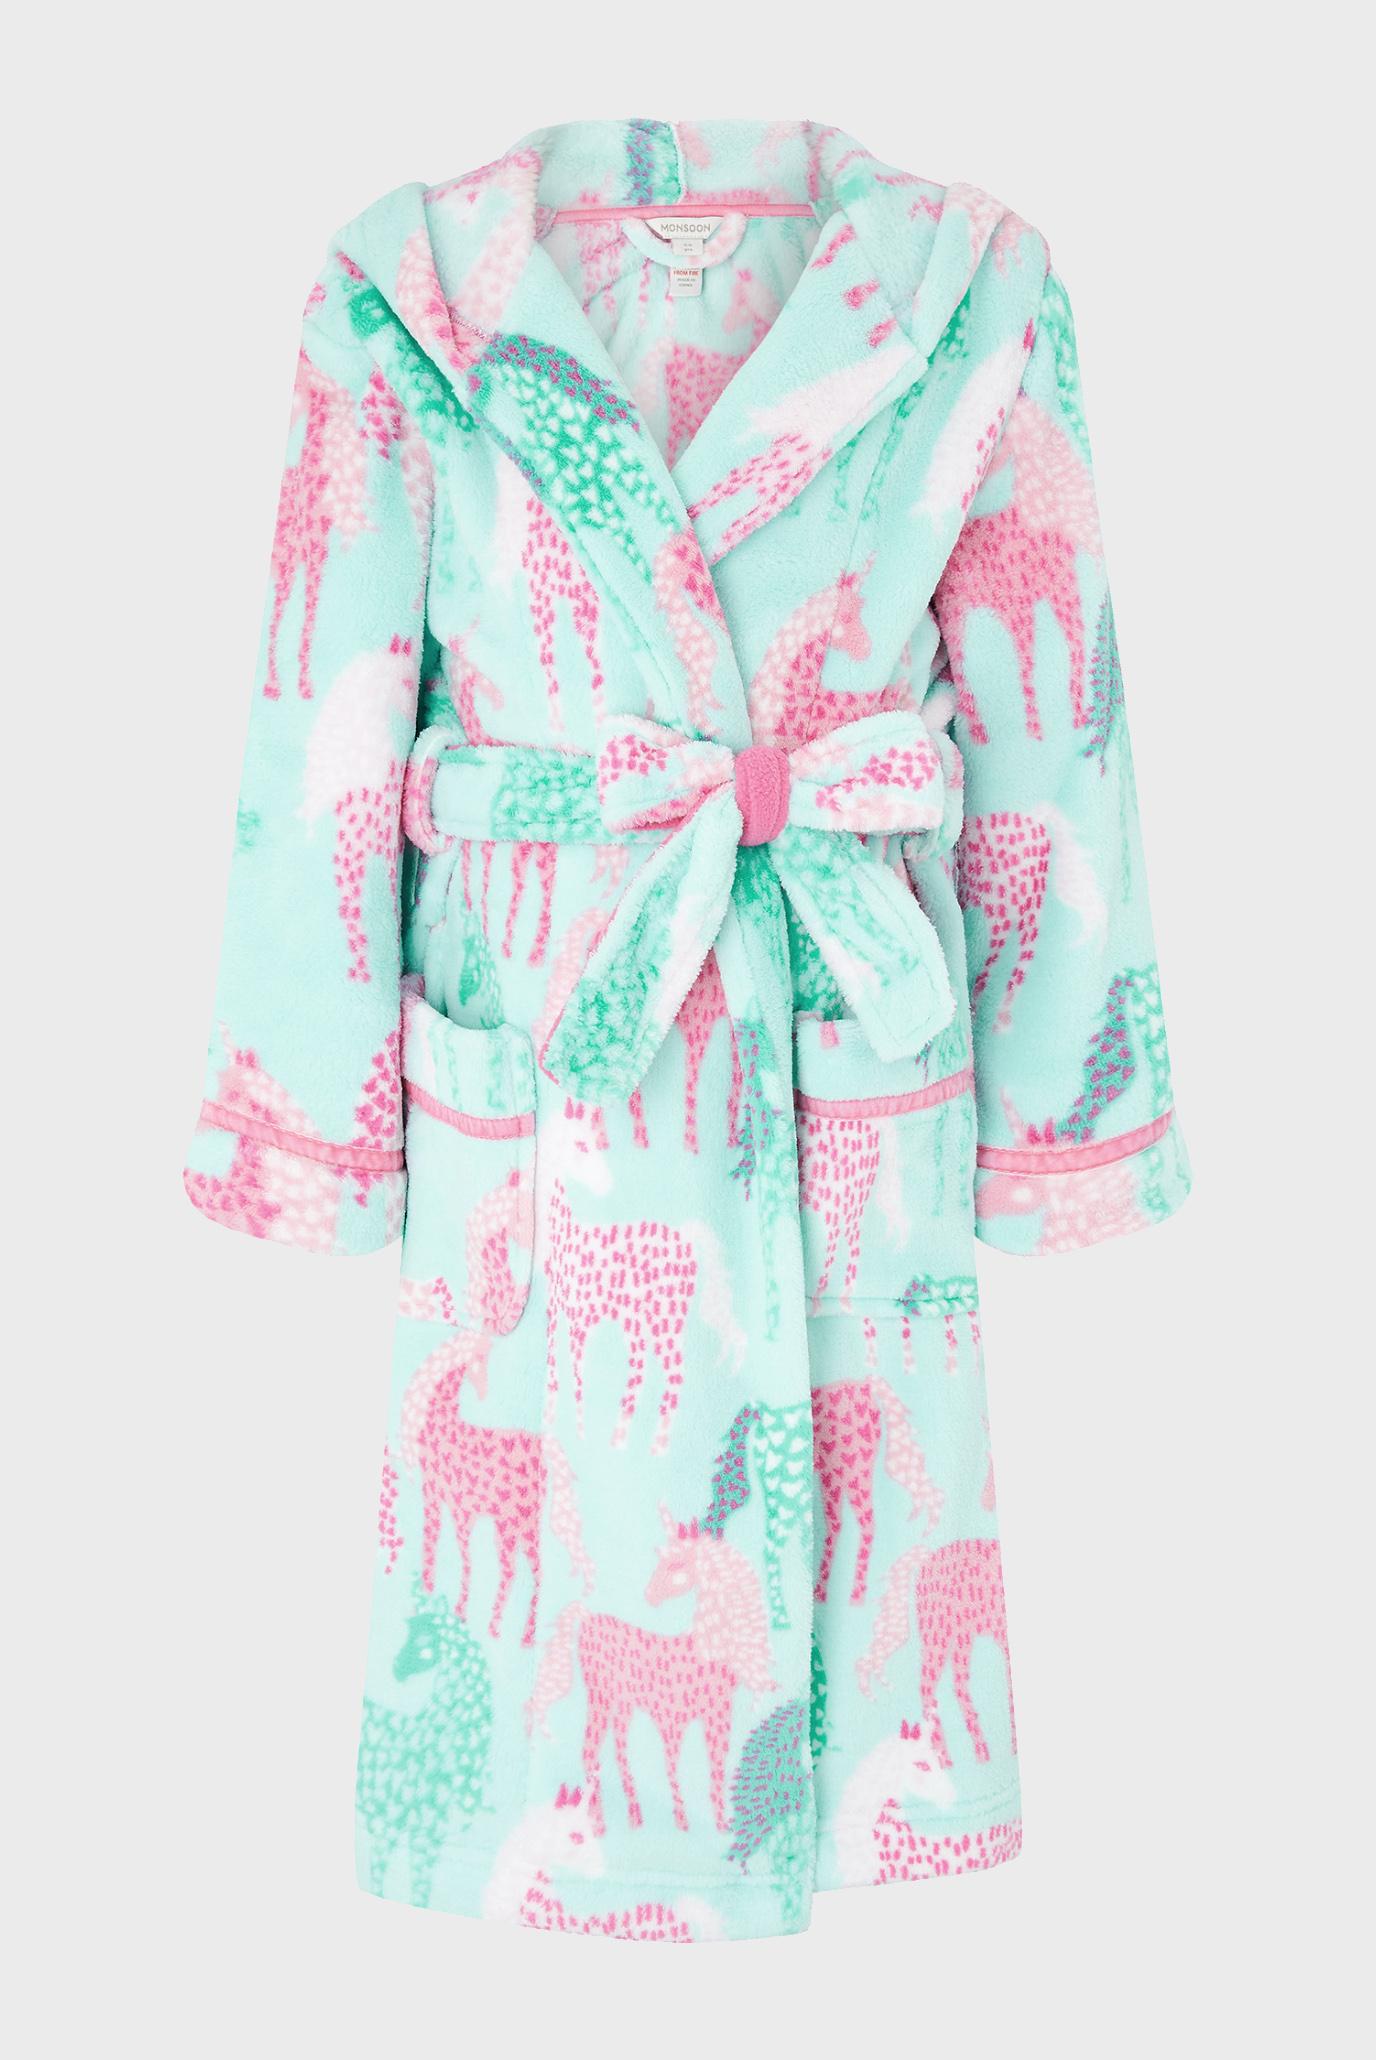 Дитячий бірюзовий халат SUSTAINABLE UNICORN 1